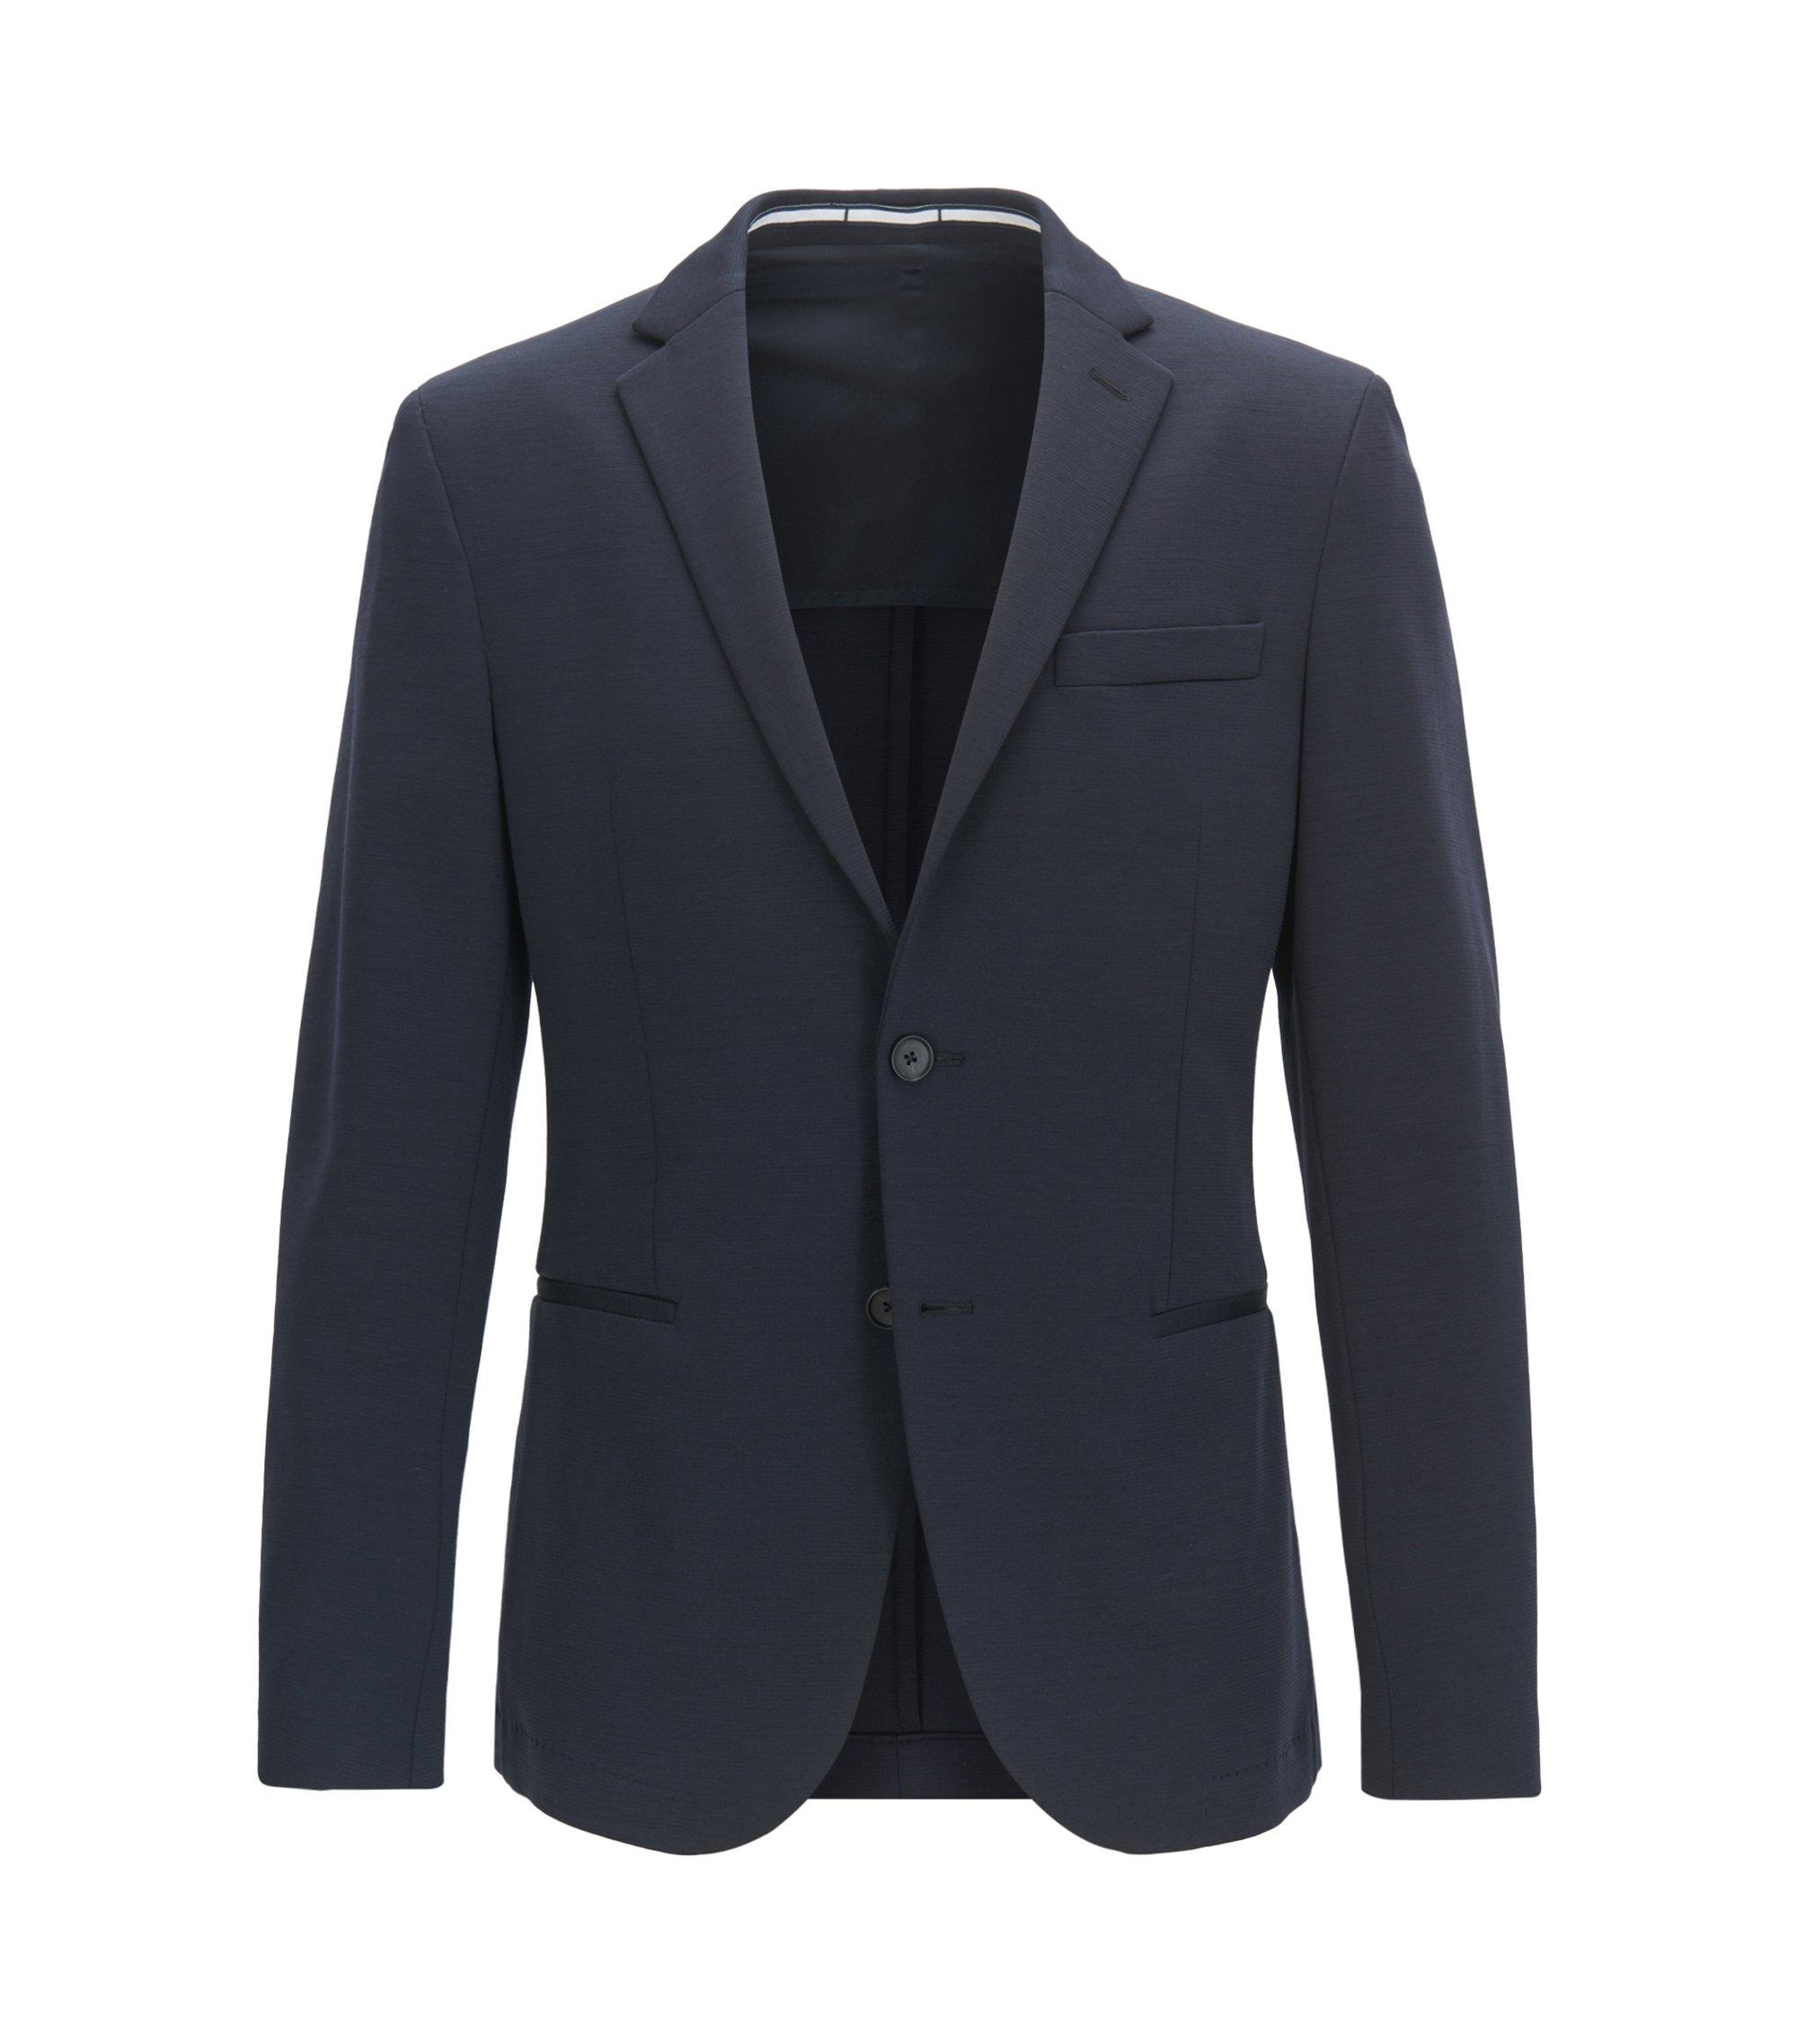 Wool Blend Sport Coat, Slim Fit | Norwin J, Dark Blue